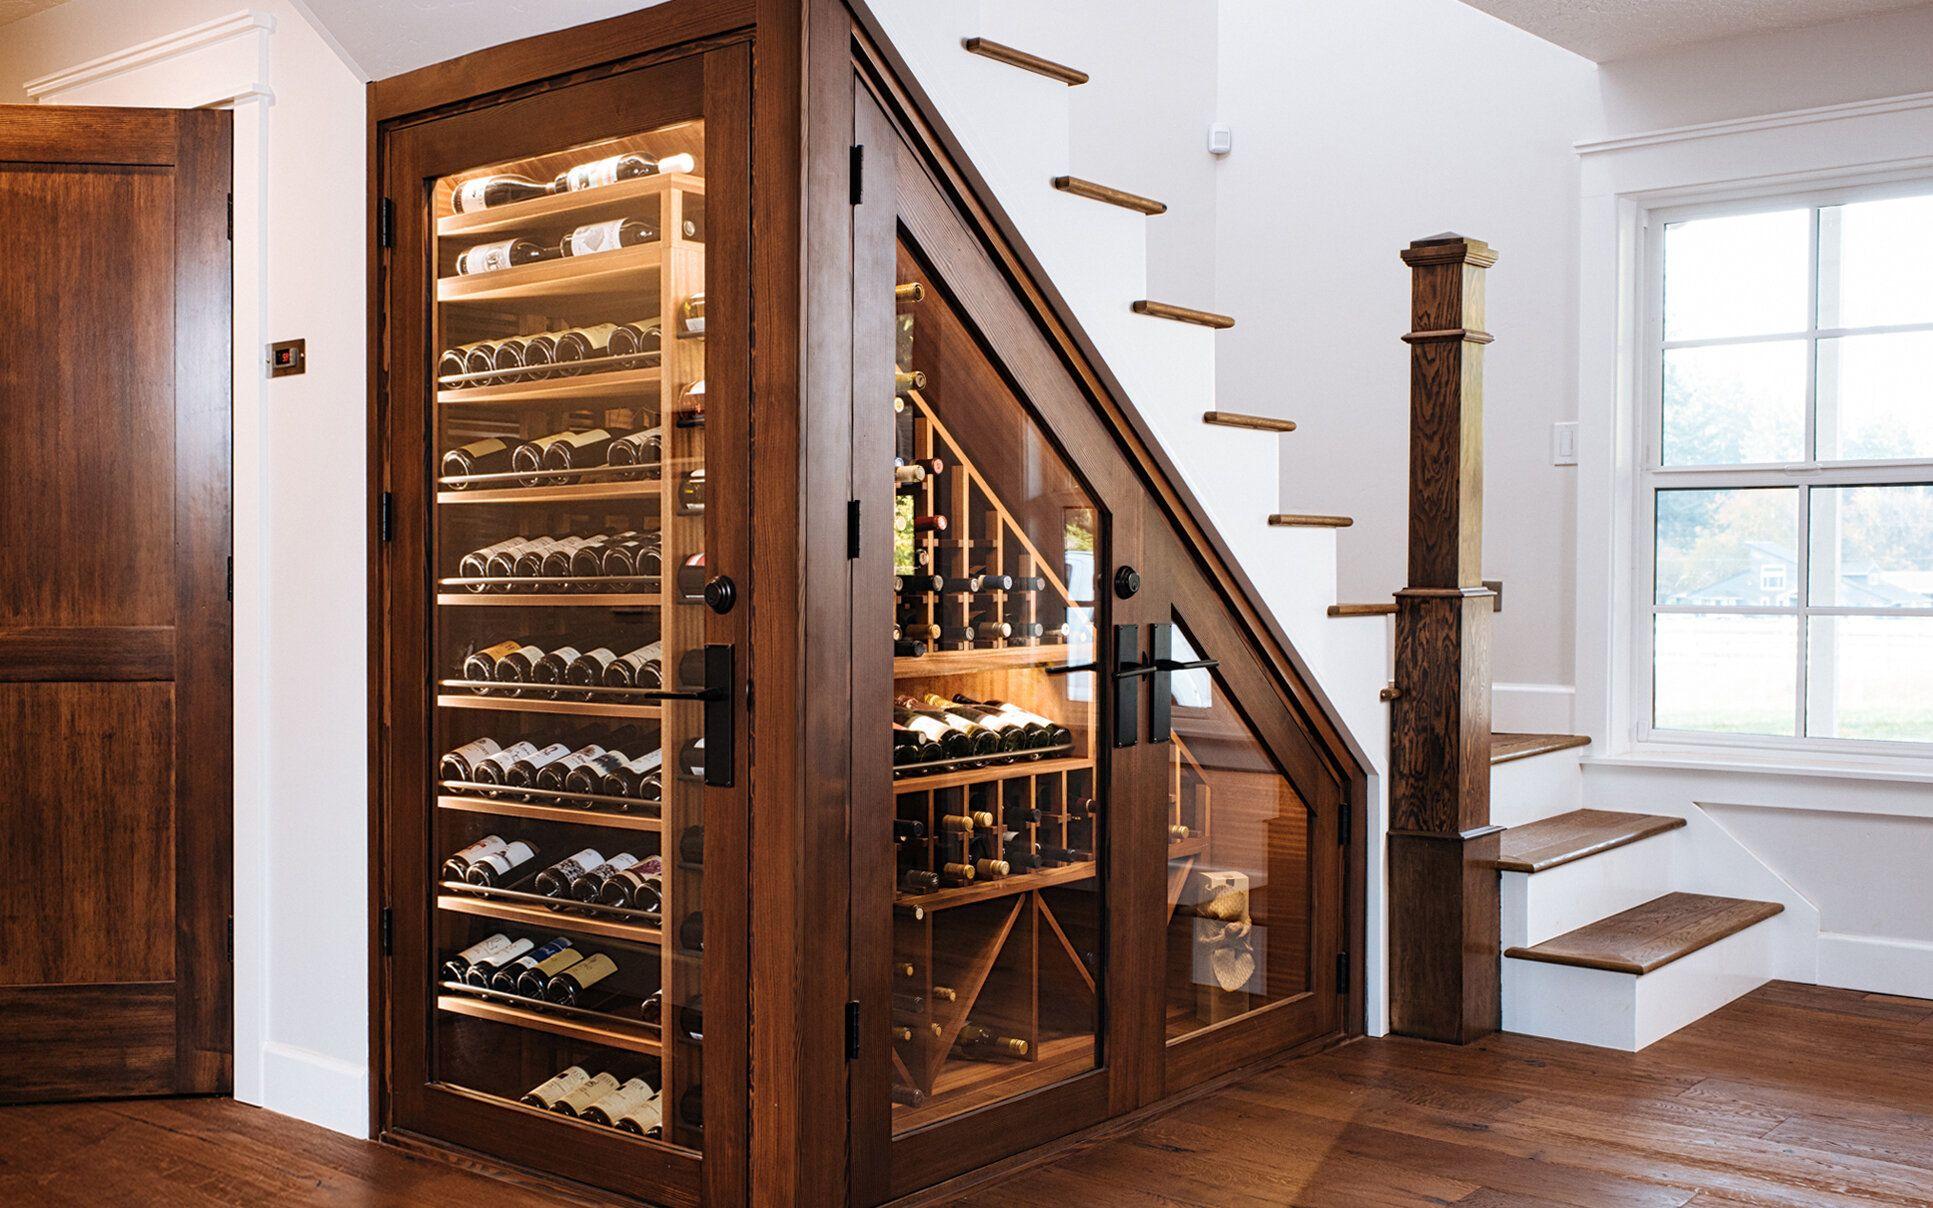 Under Stairs Wine Cellar Under Stairs Wine Cellar Home Wine Cellars Under Stairs